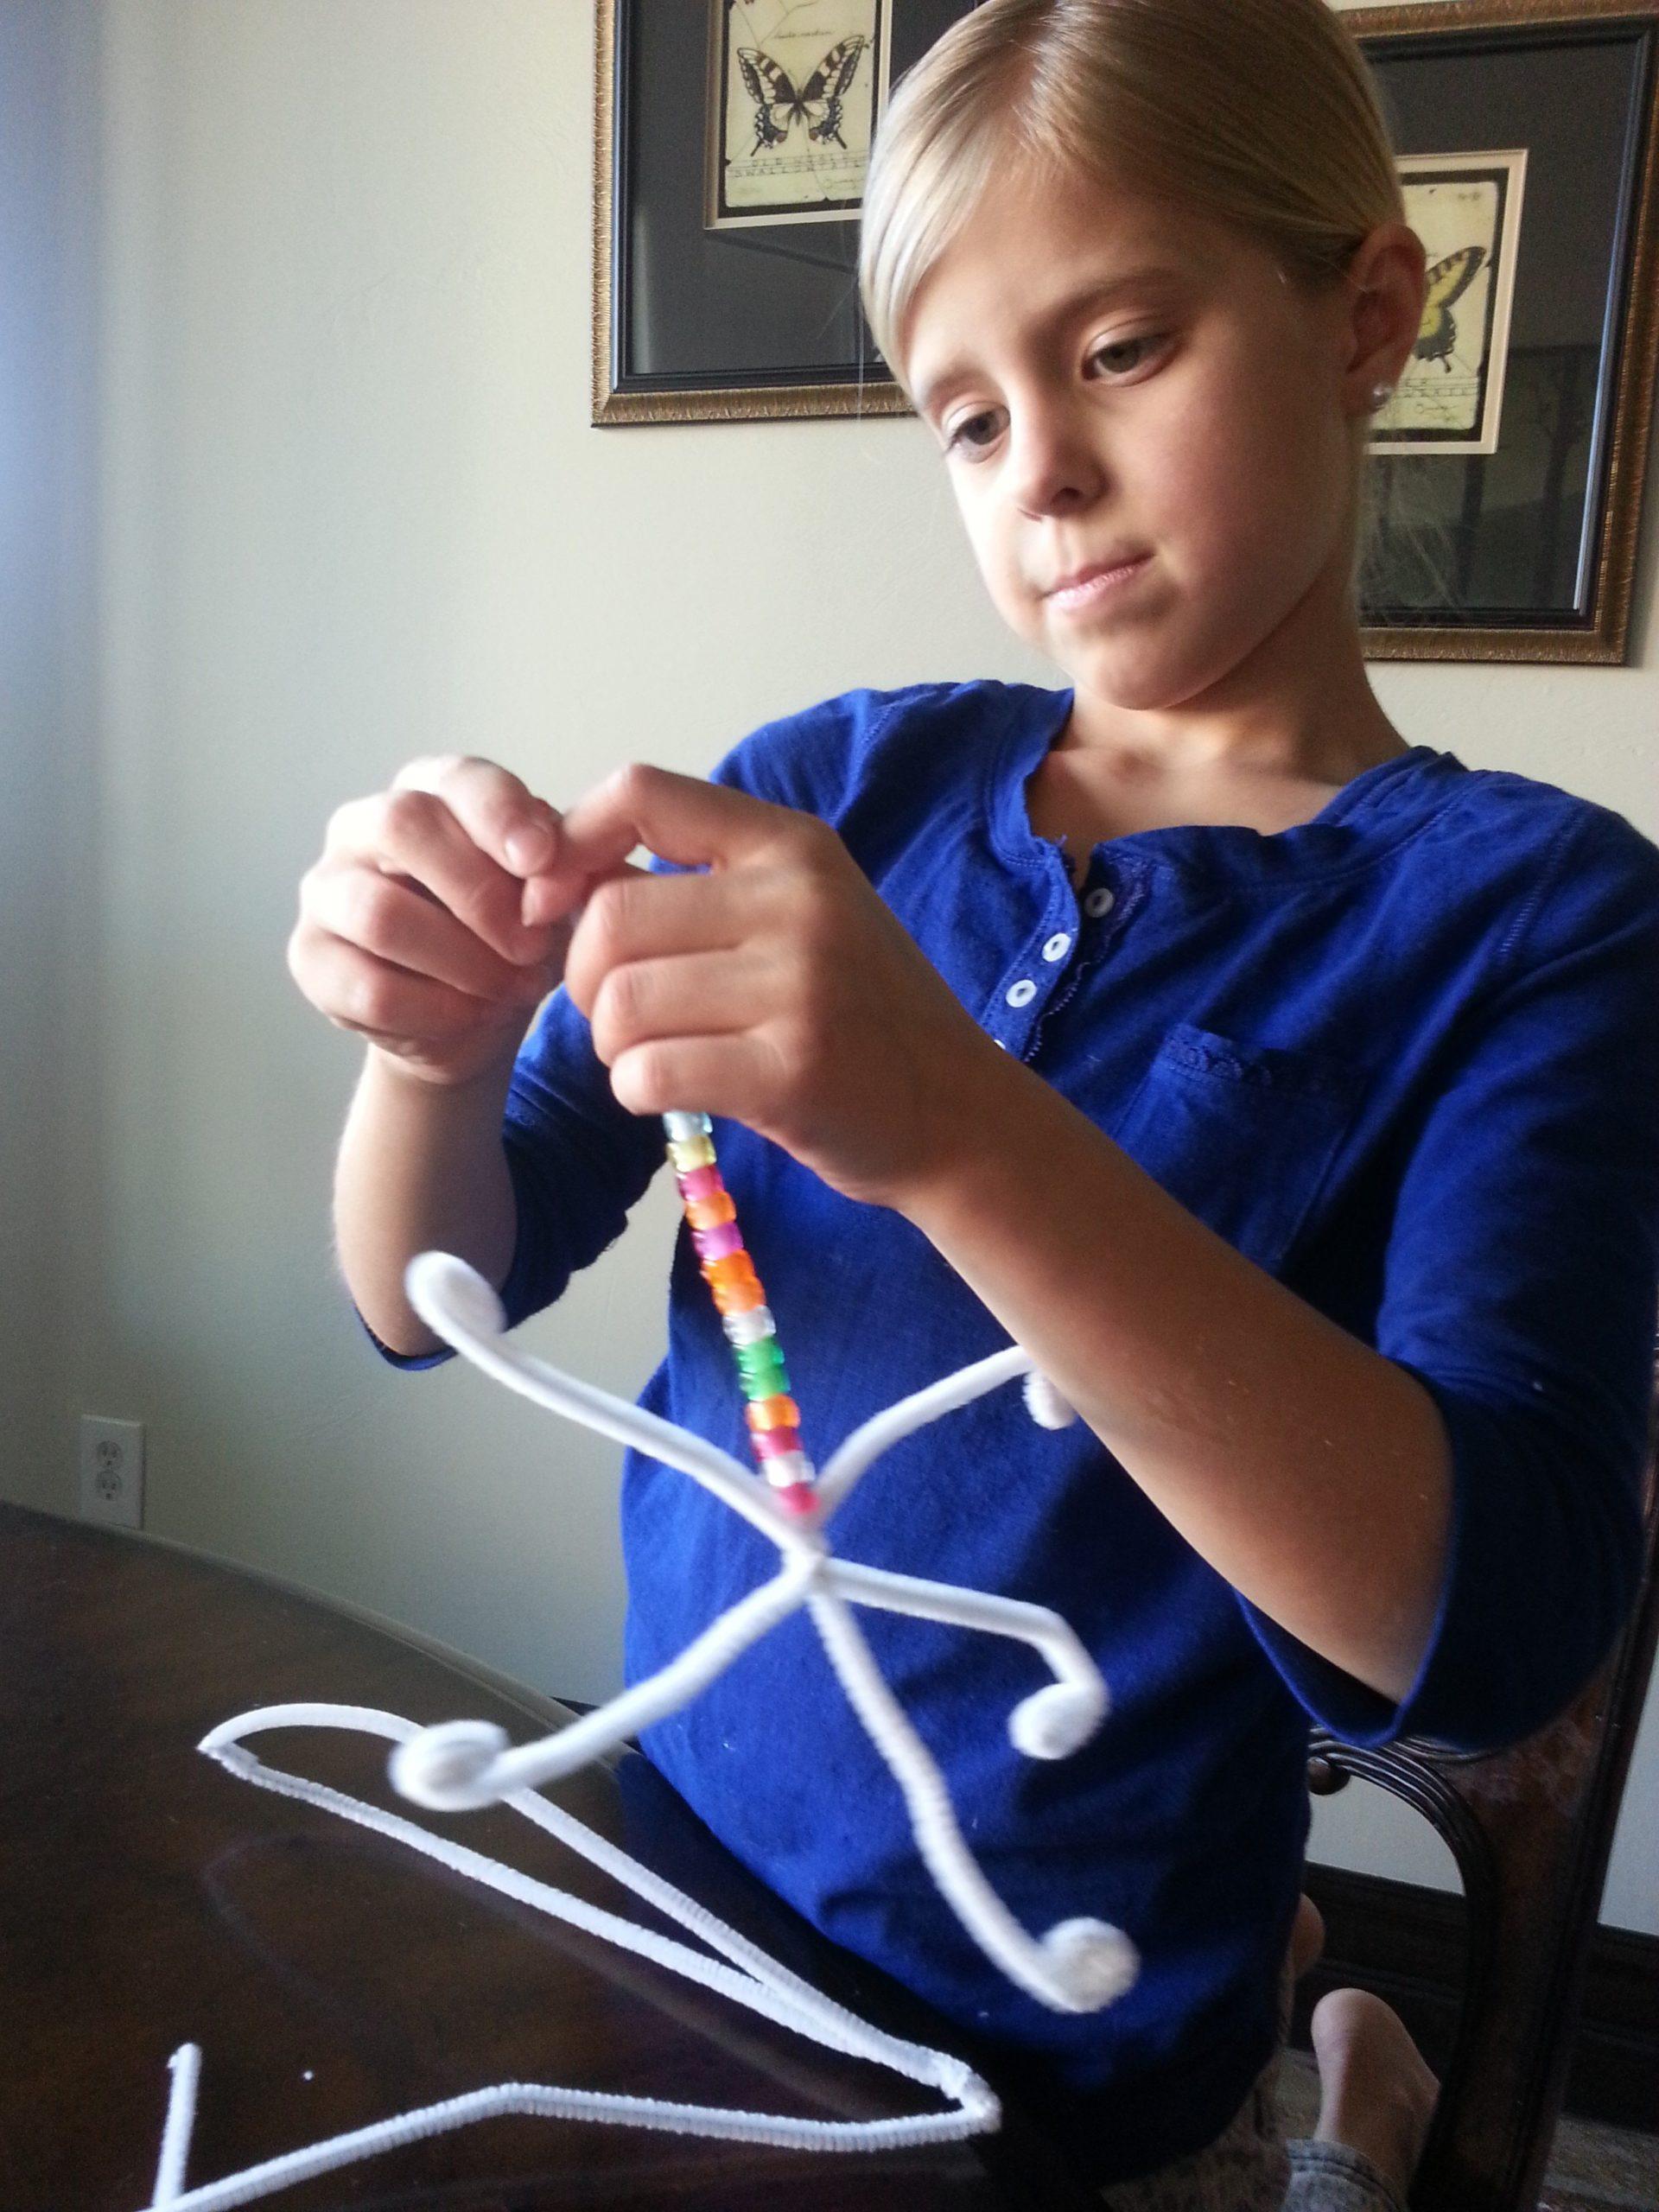 #PowellPack #KidsCrafts #Snowflakes #WinterCrafts